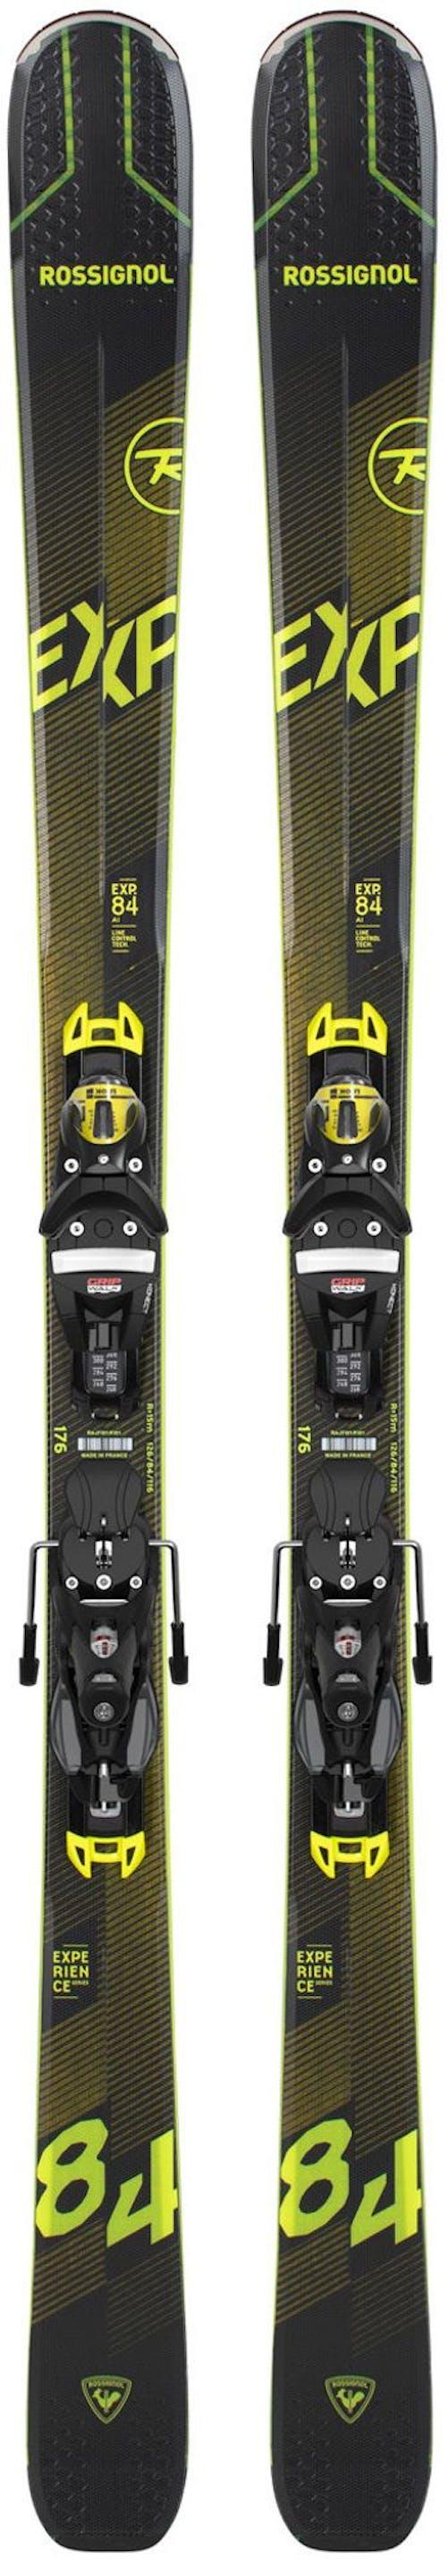 Rossignol Experience 84 AI Skis + SPX 12 Konect Gw Bindings · 2021